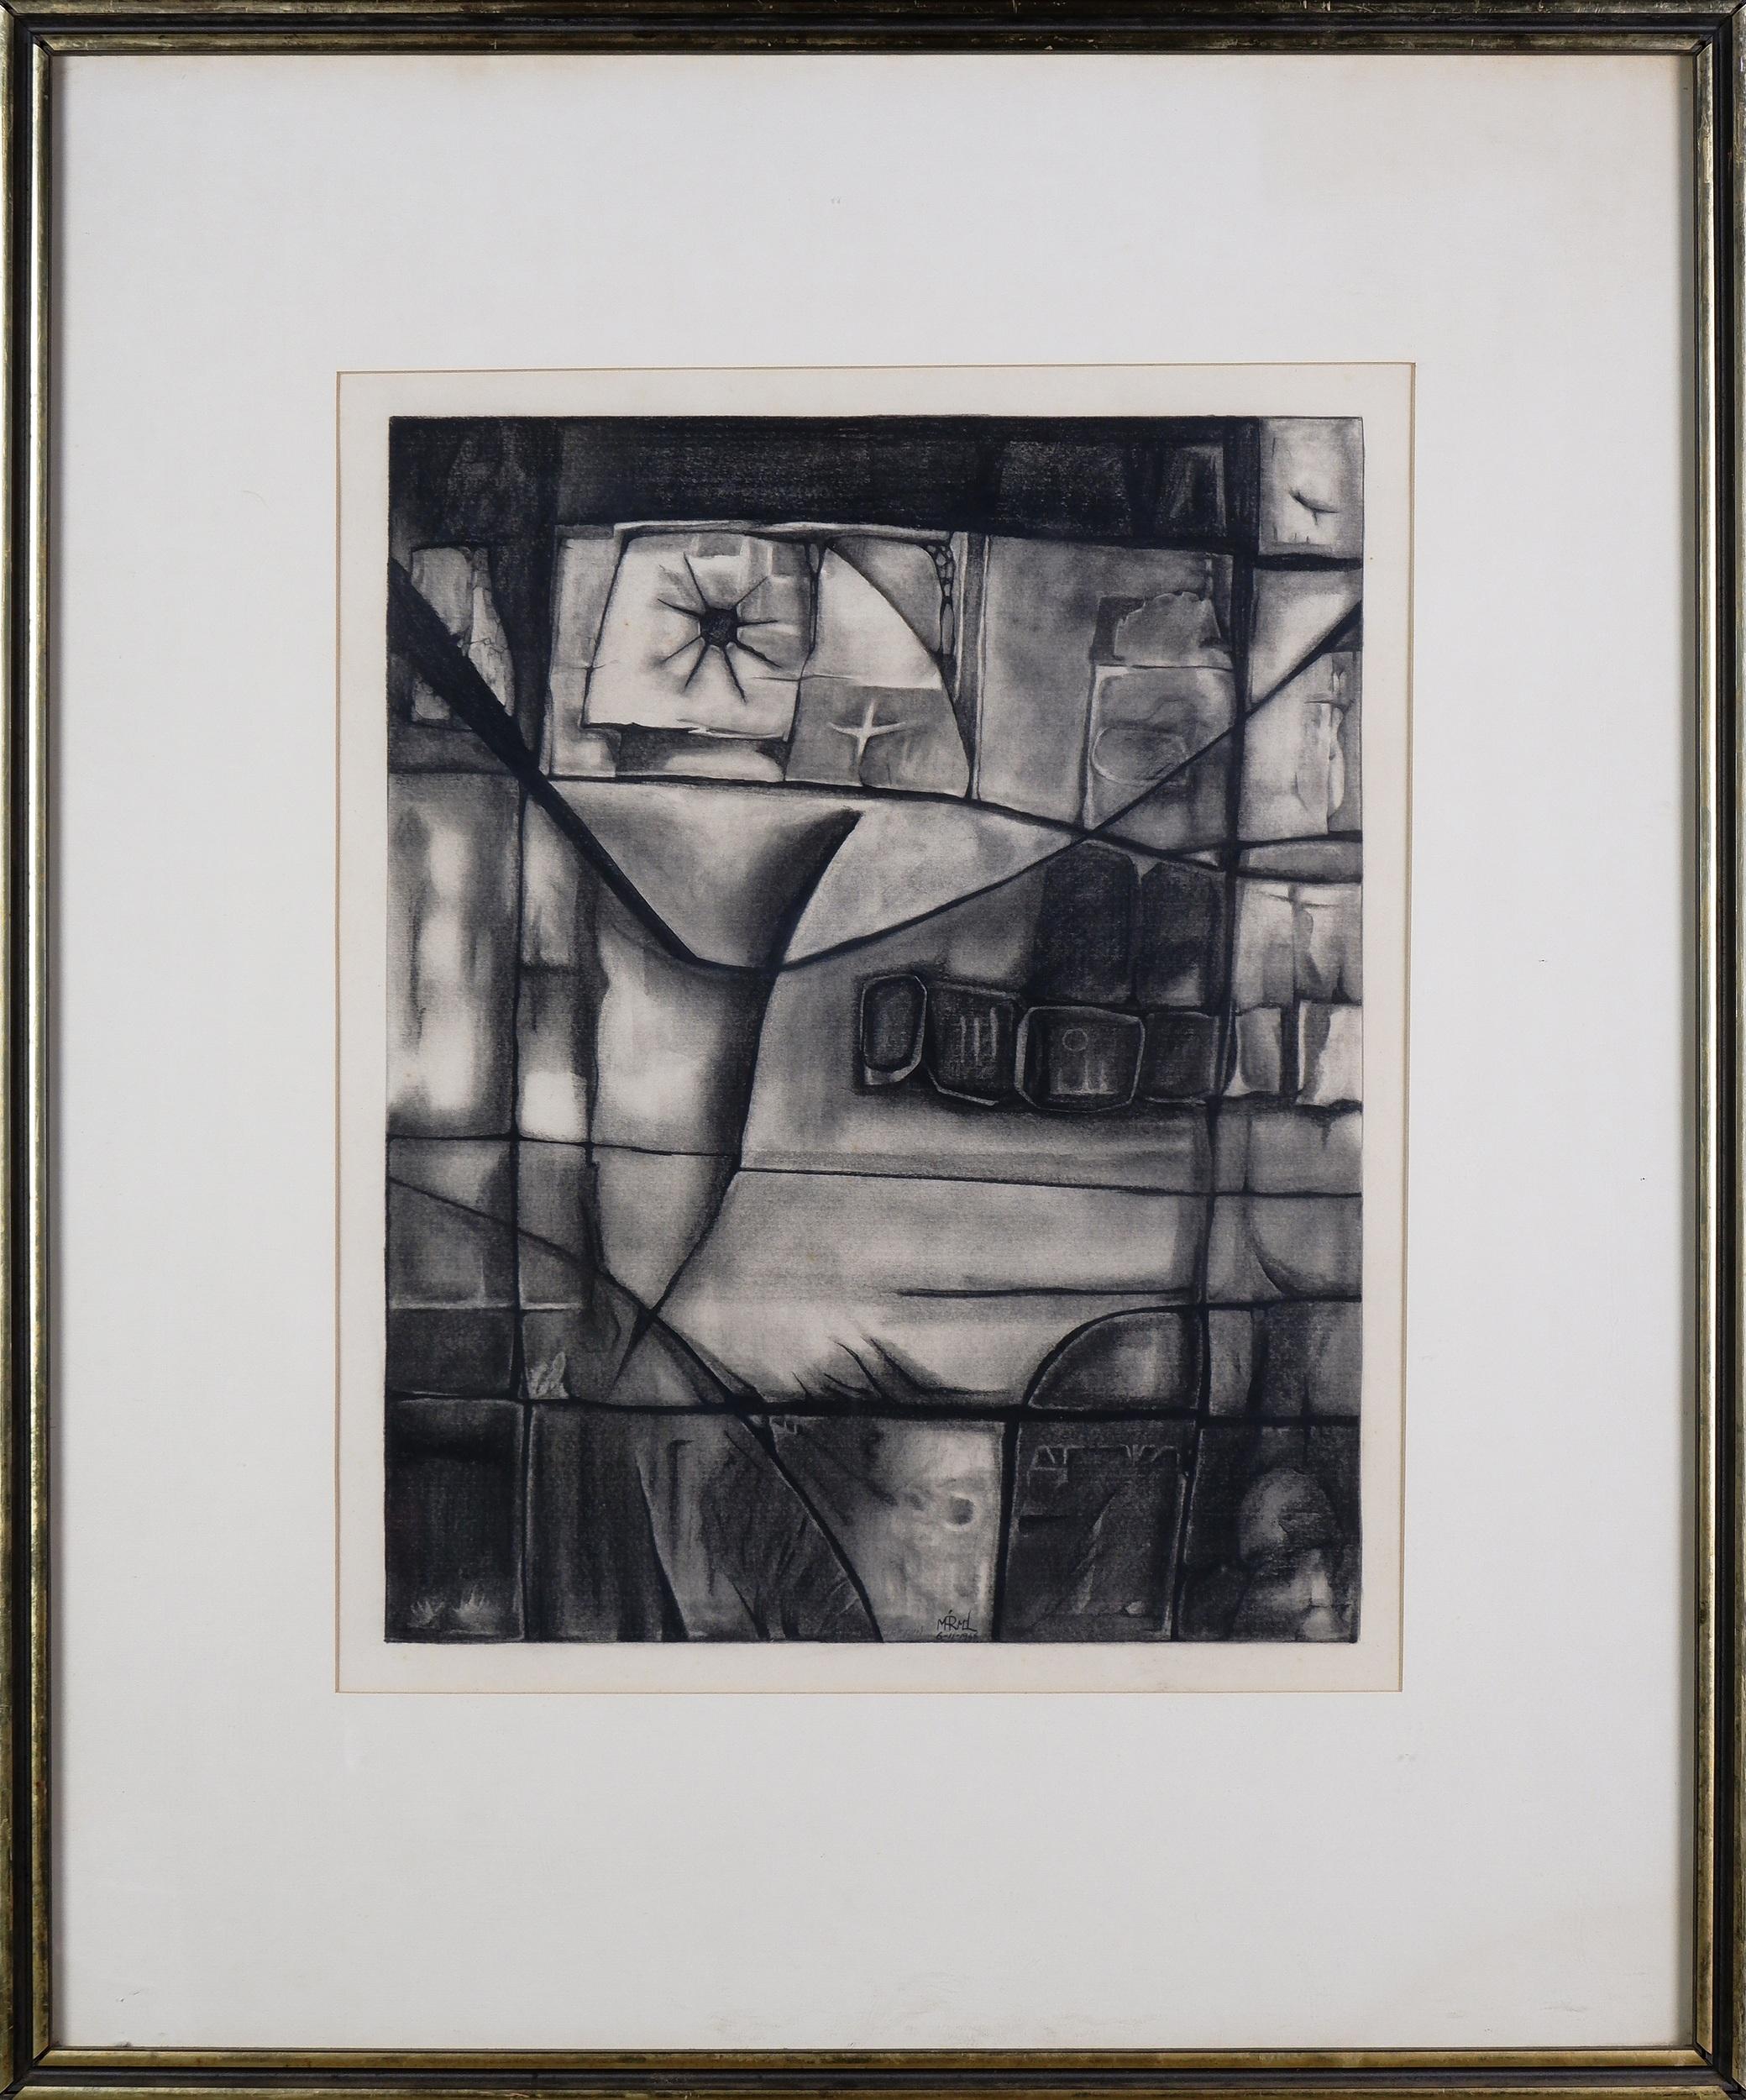 'Ignacio Marmol (1934-1994), Zampun 1966, Charcoal, 50 x 40 cm'